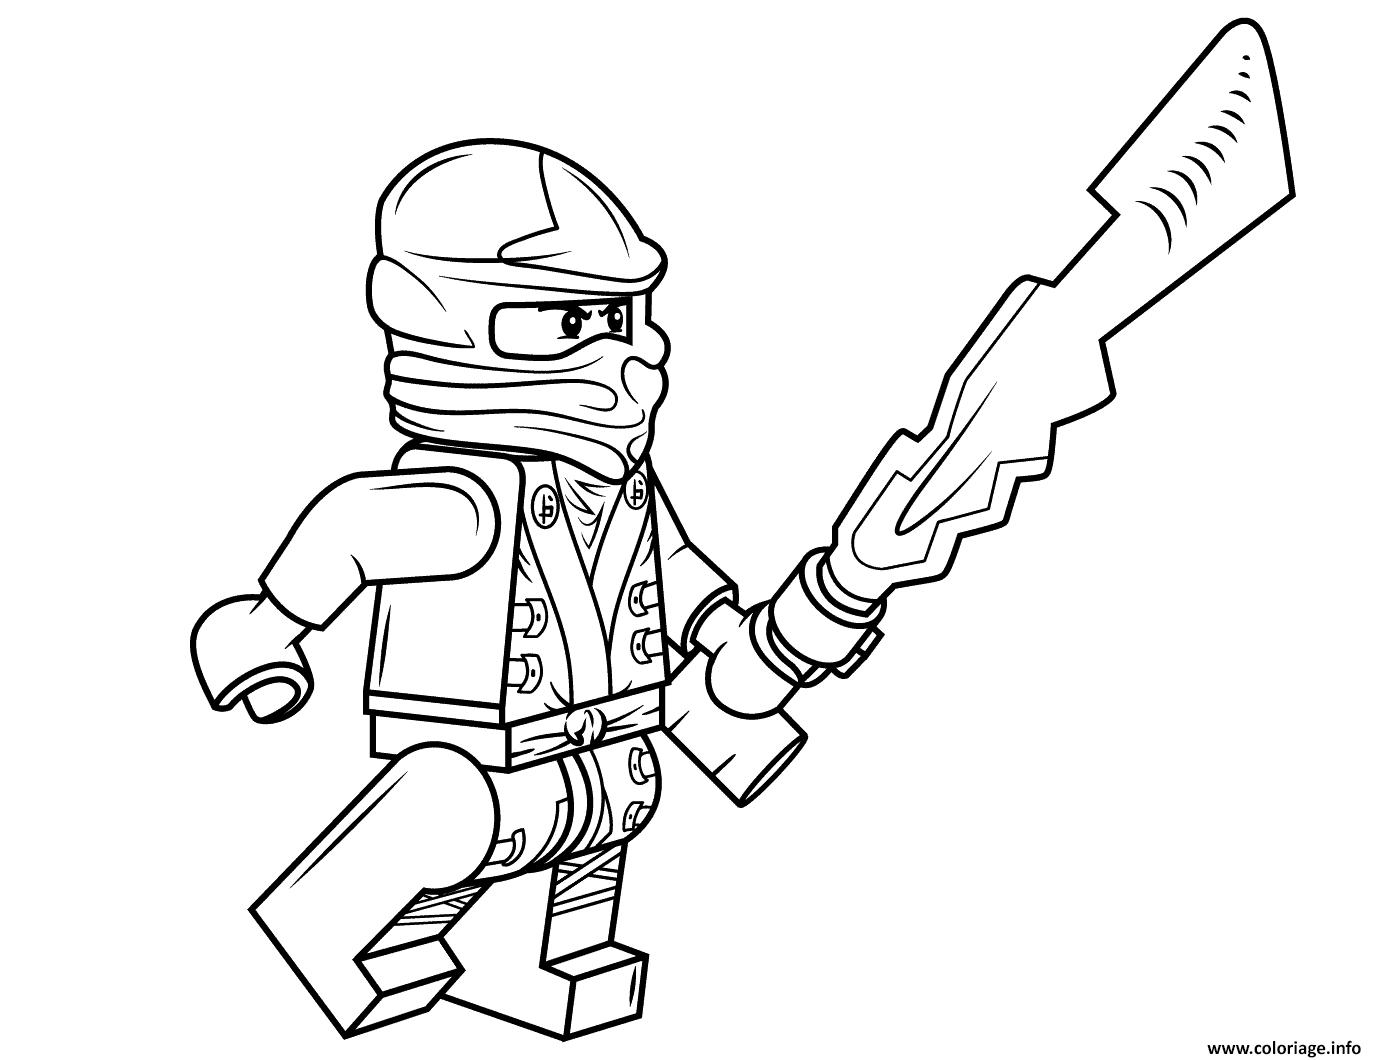 Coloriage lego ninjago cole dessin - Ninjago jeux gratuit ...